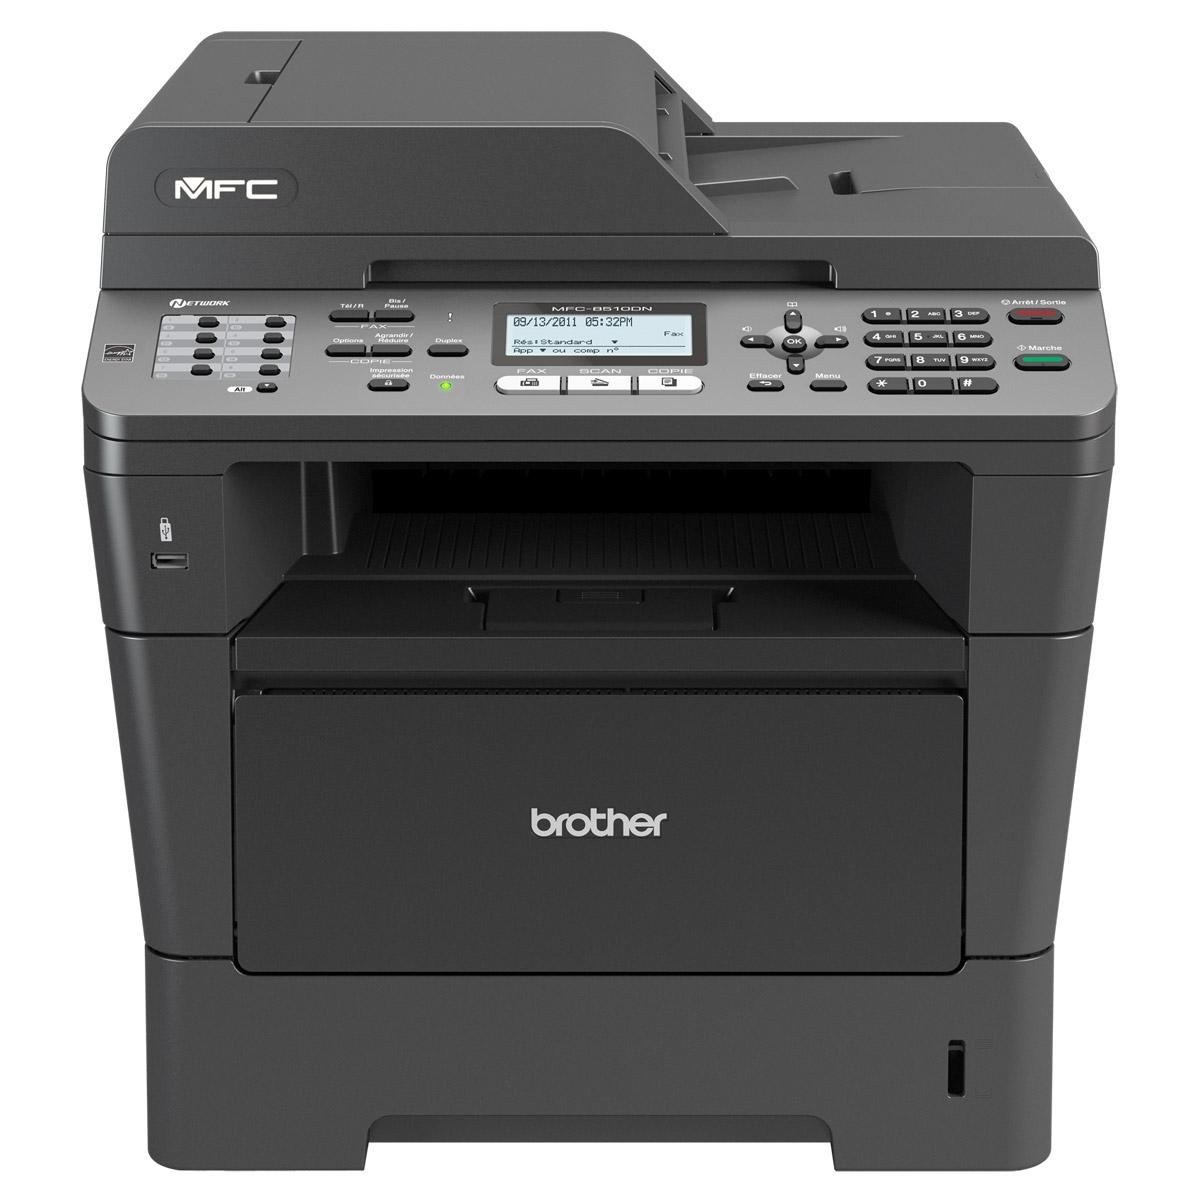 Принтер Brother MFC-8510DN